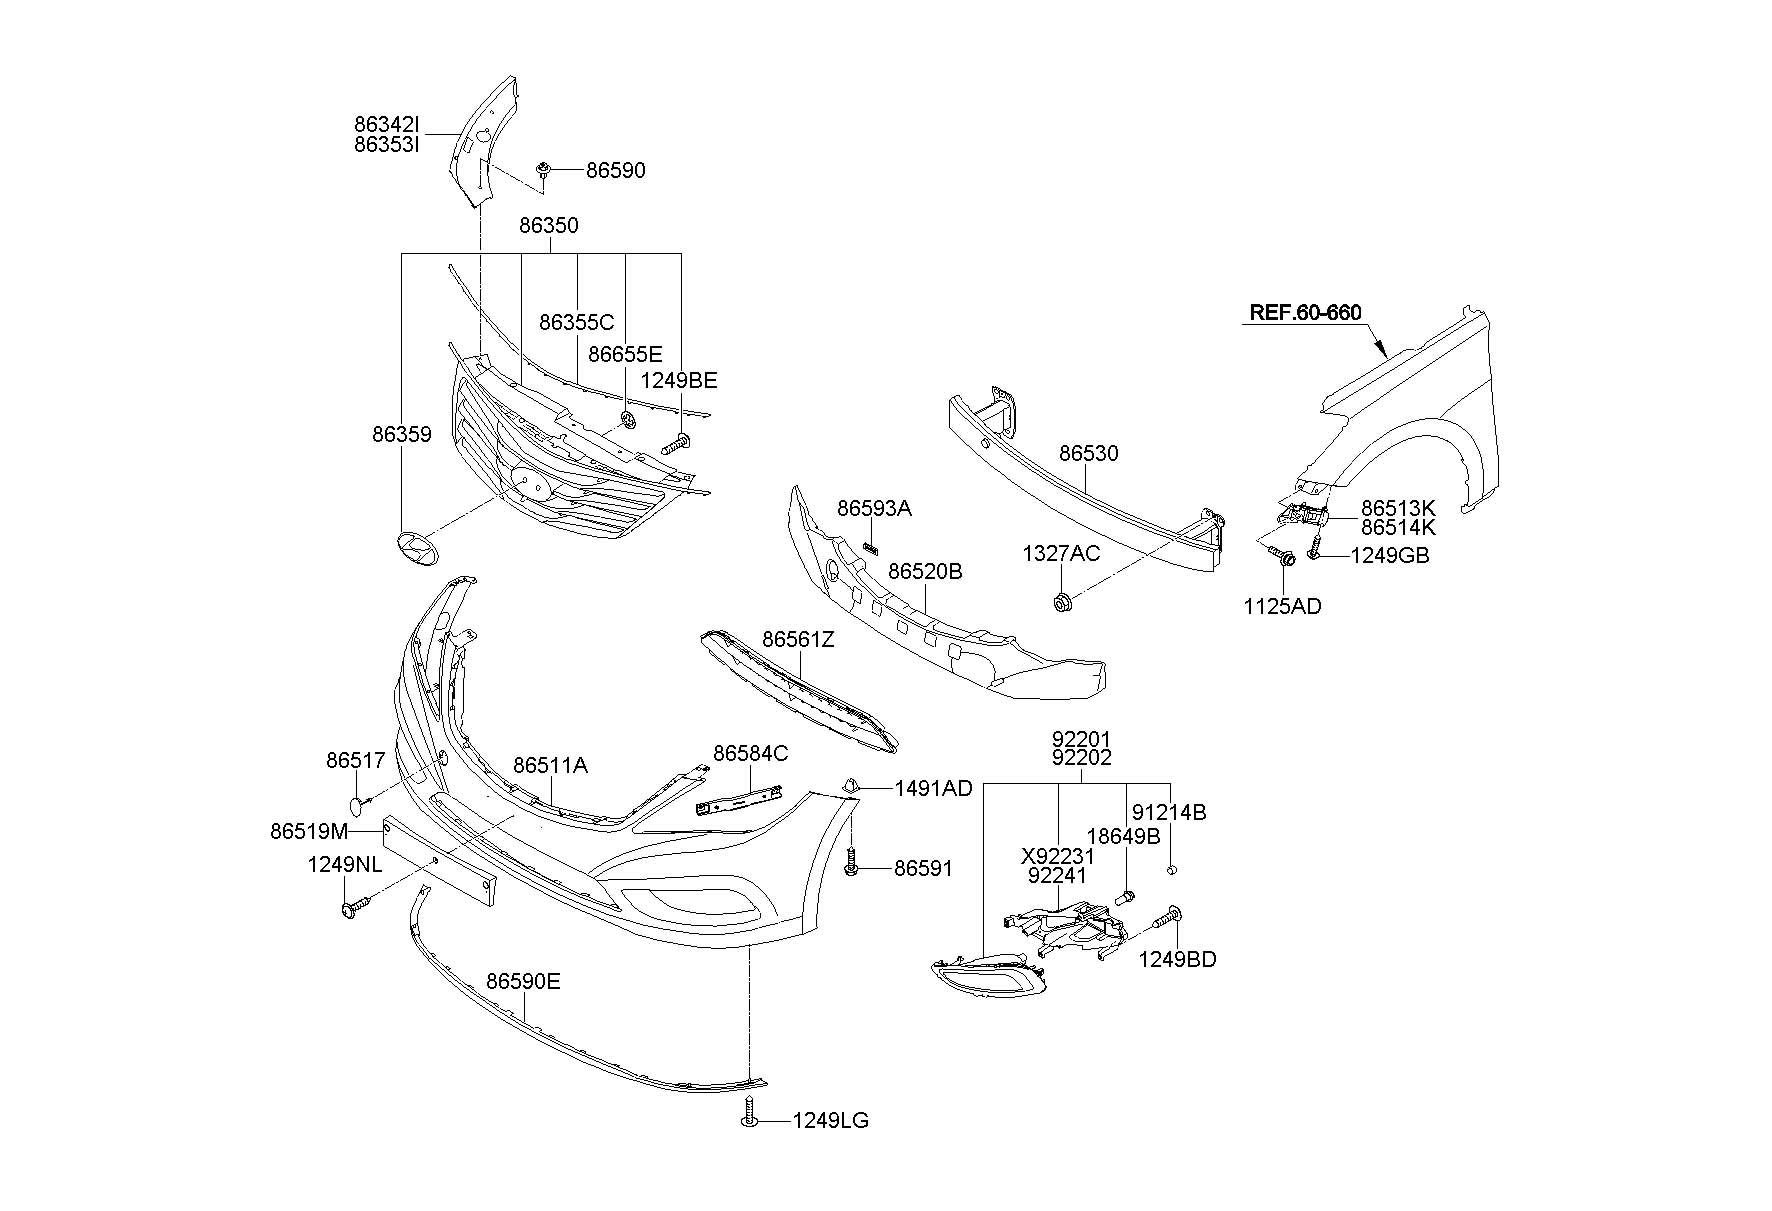 tags: #2005 hyundai elantra engine diagram#hyundai sonata engine diagram#2004  hyundai sonata engine diagram#hyundai tucson engine diagram#2005 hyundai